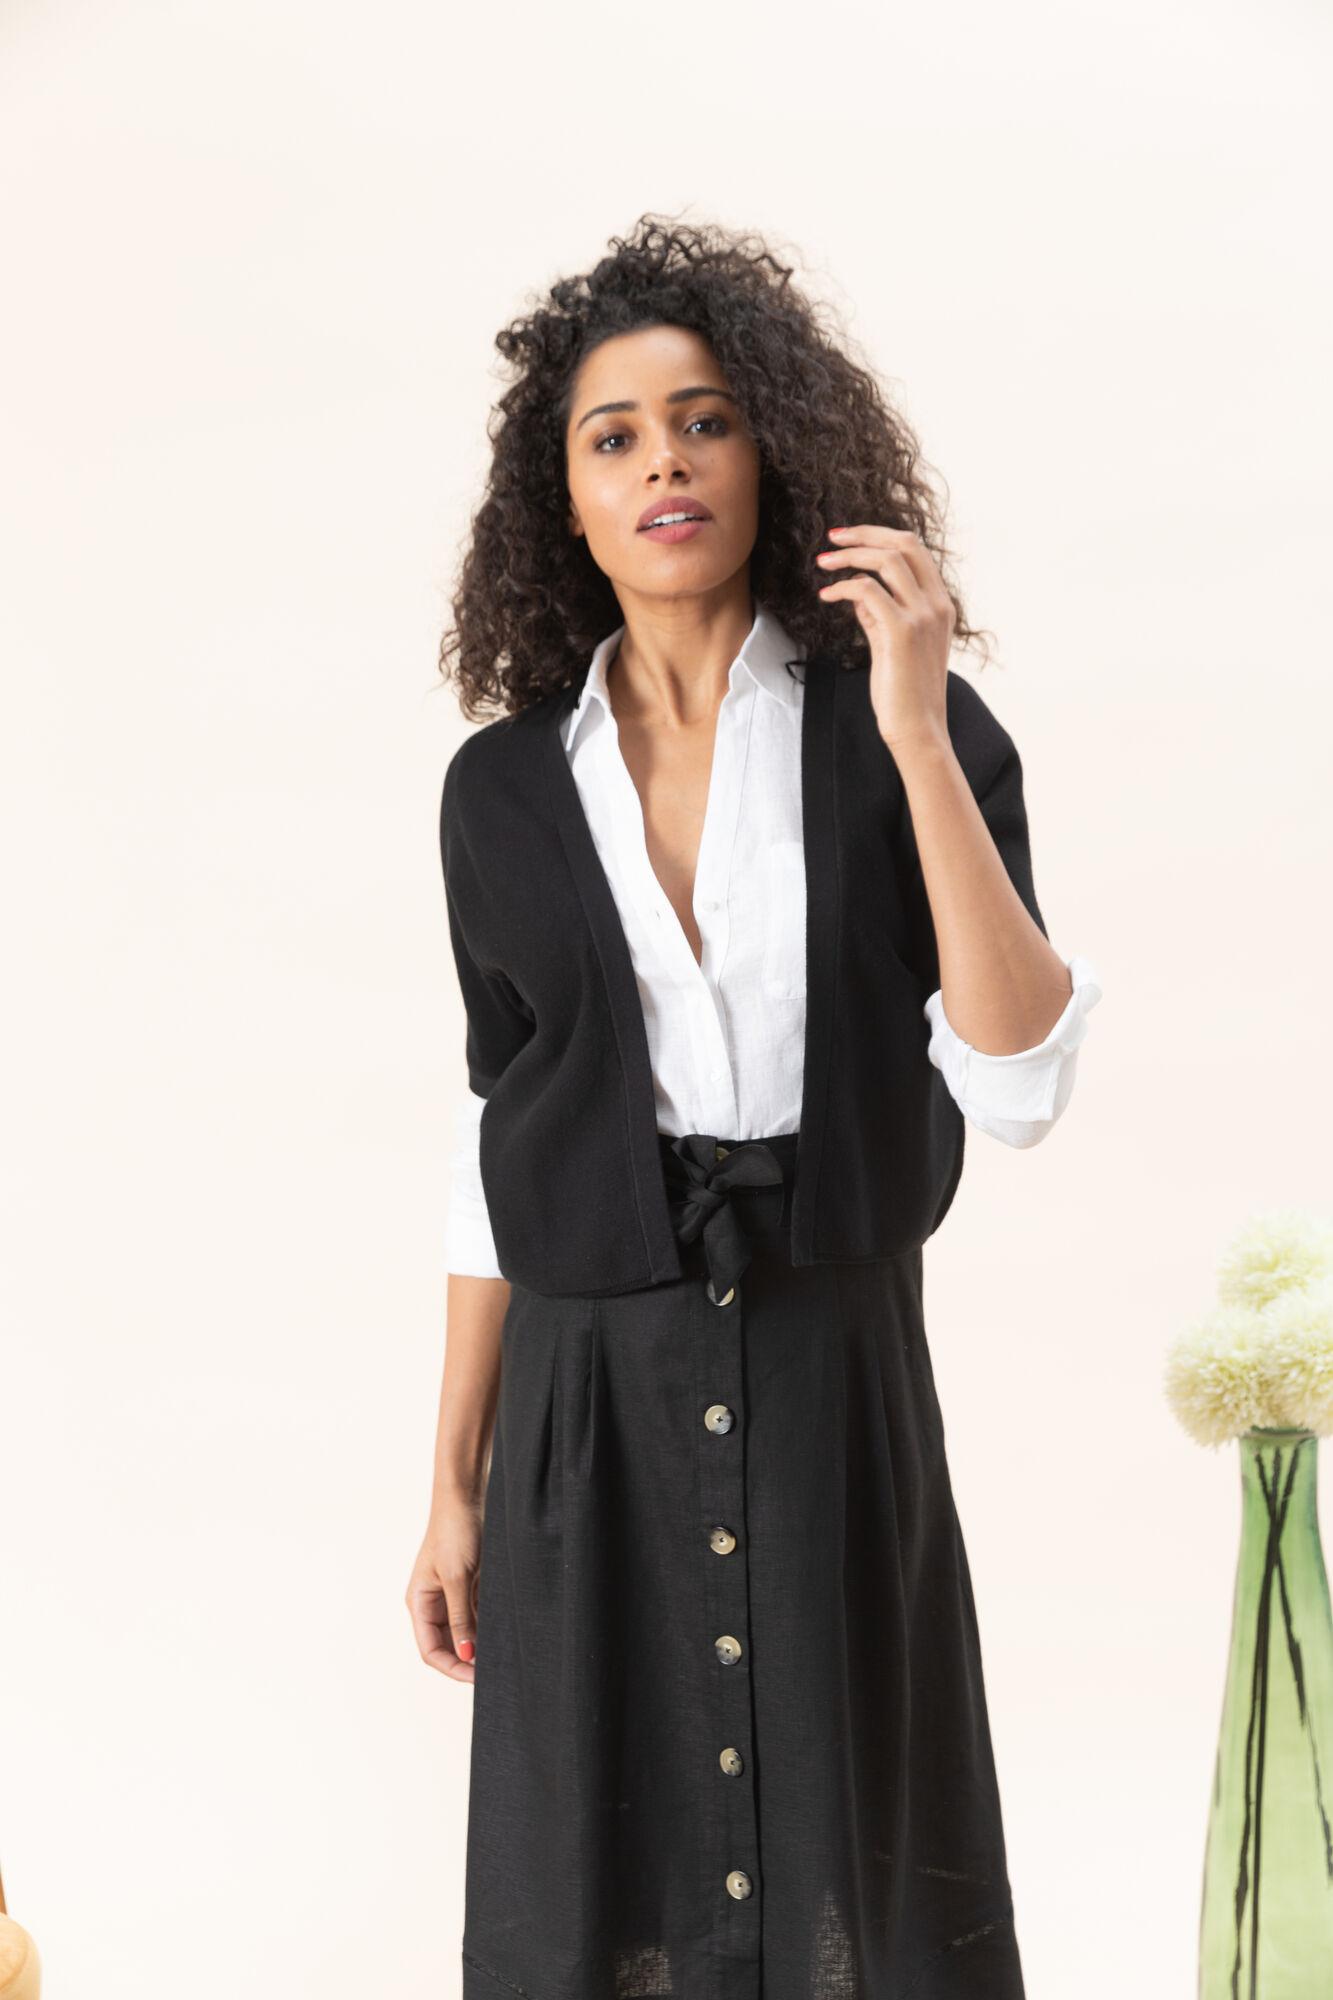 Zwarte Trui Dames.Trui En Vest Lucille Zwarte Trui En Vest Voor Dames Voor 70 00